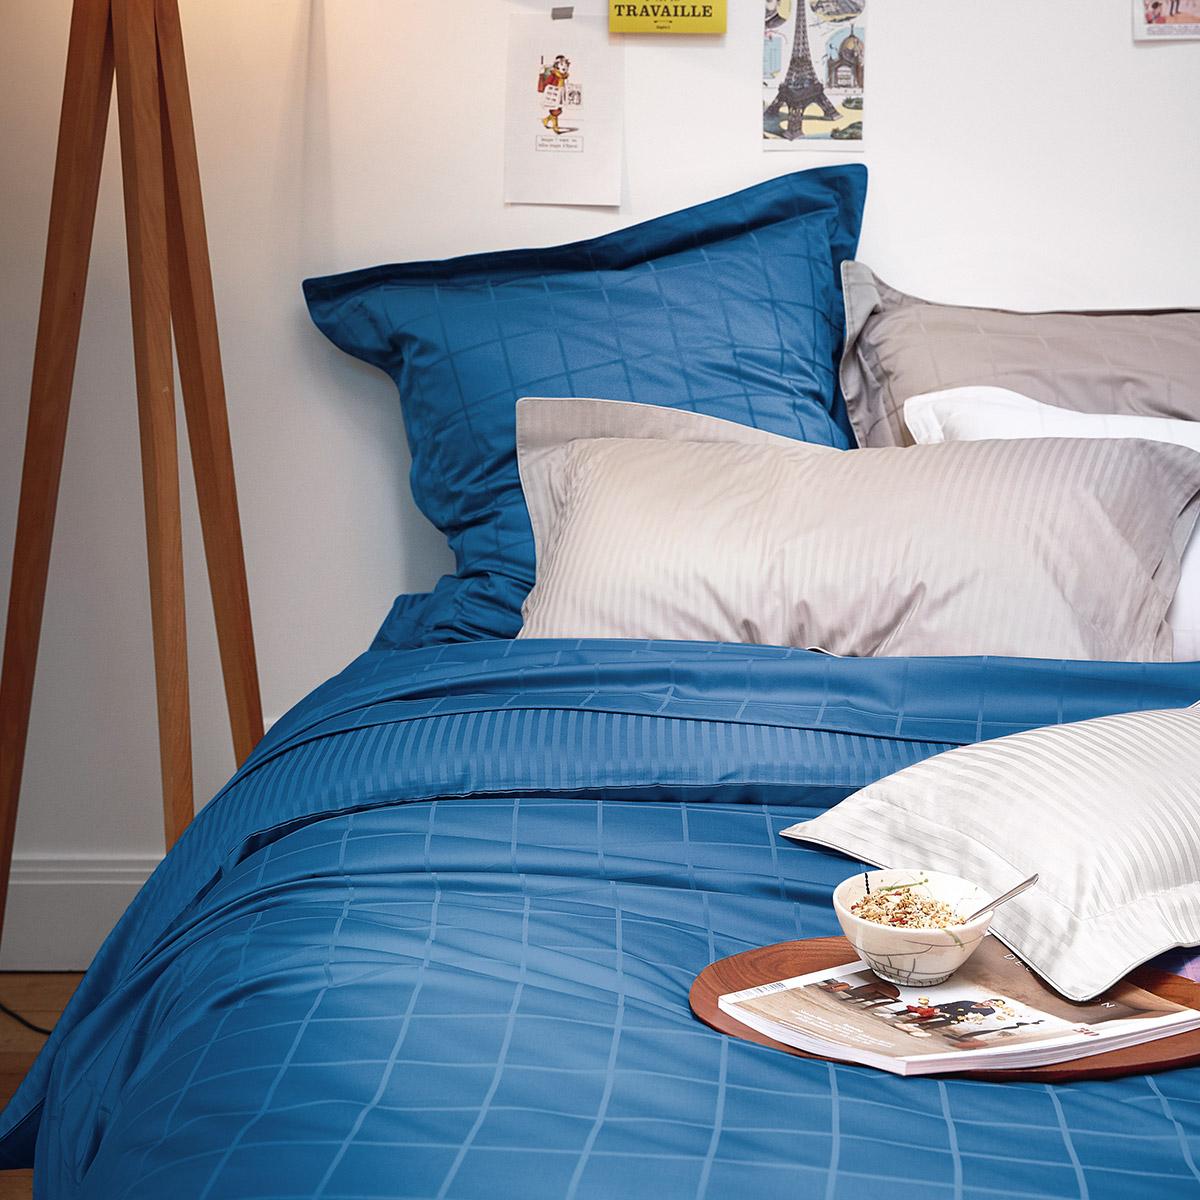 Drap housse satin Bleu 180 x 200 cm